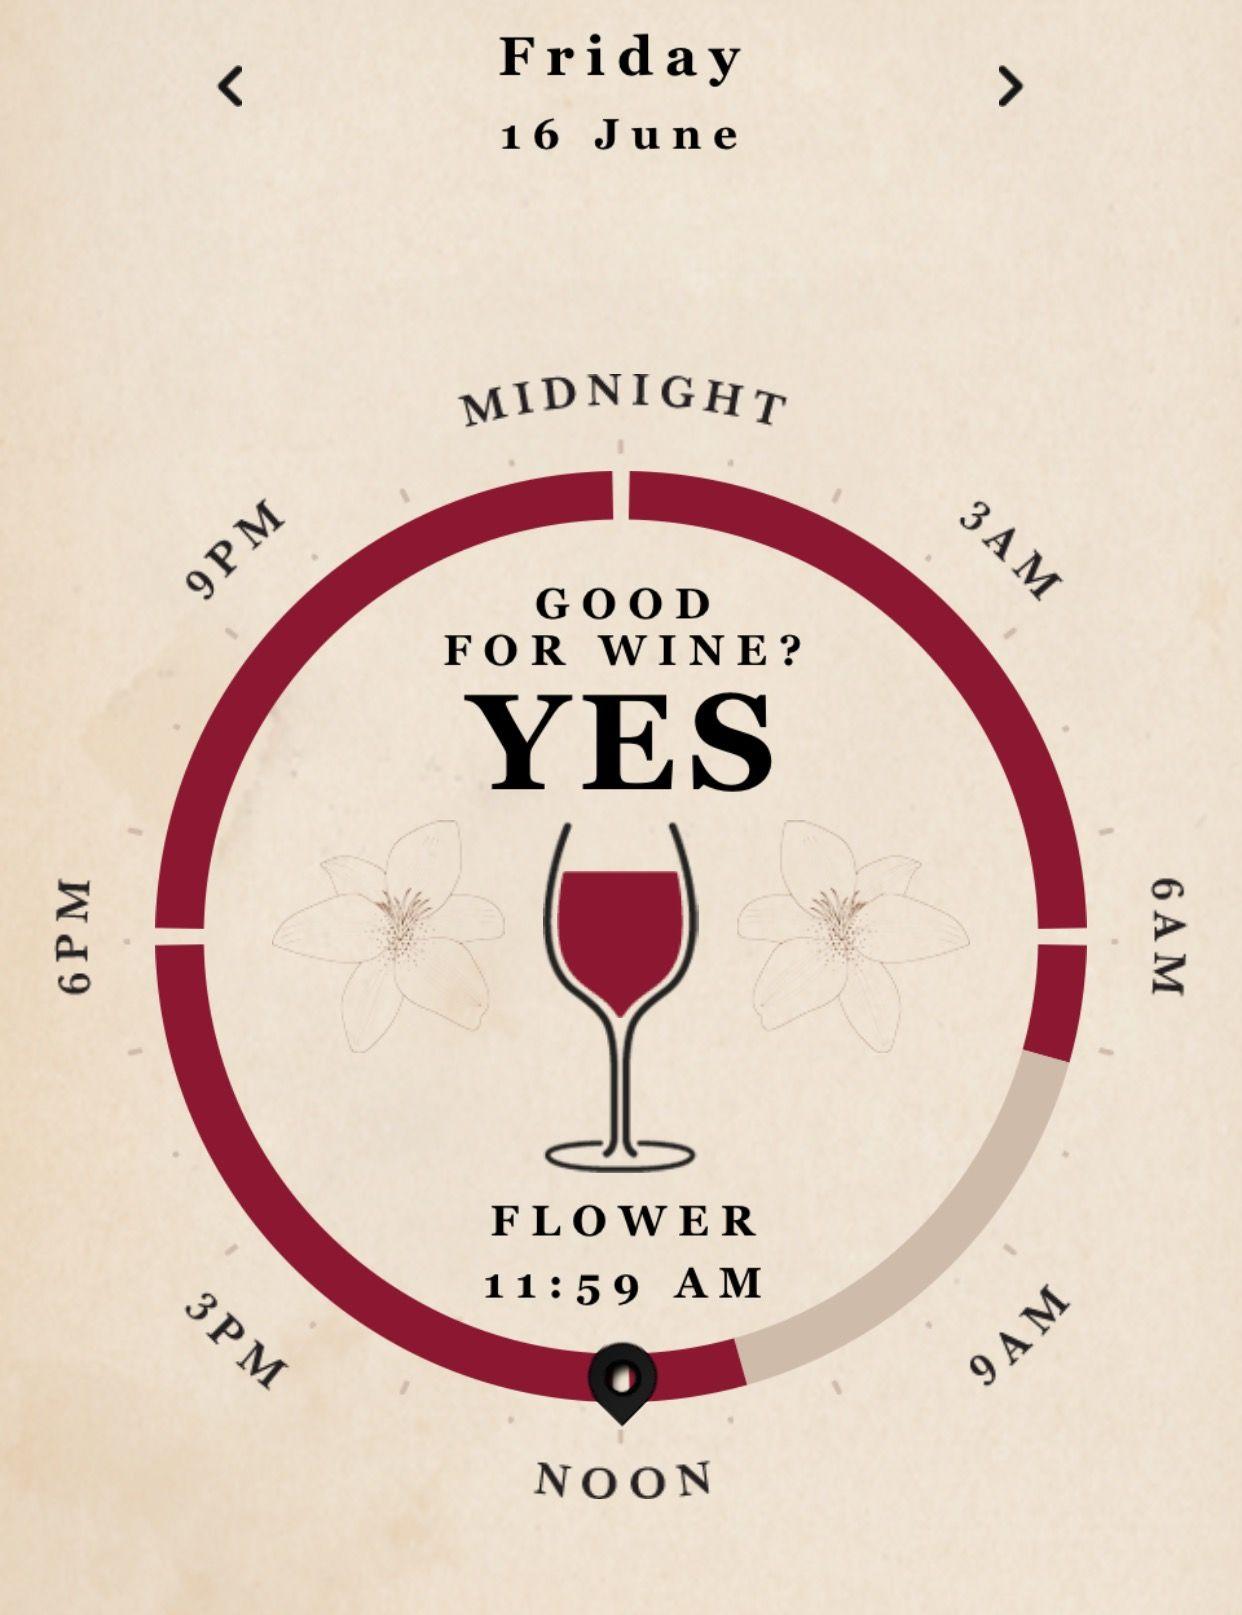 Happy Friday Biodynamic Flower Day Great To Taste Or Drink Wine